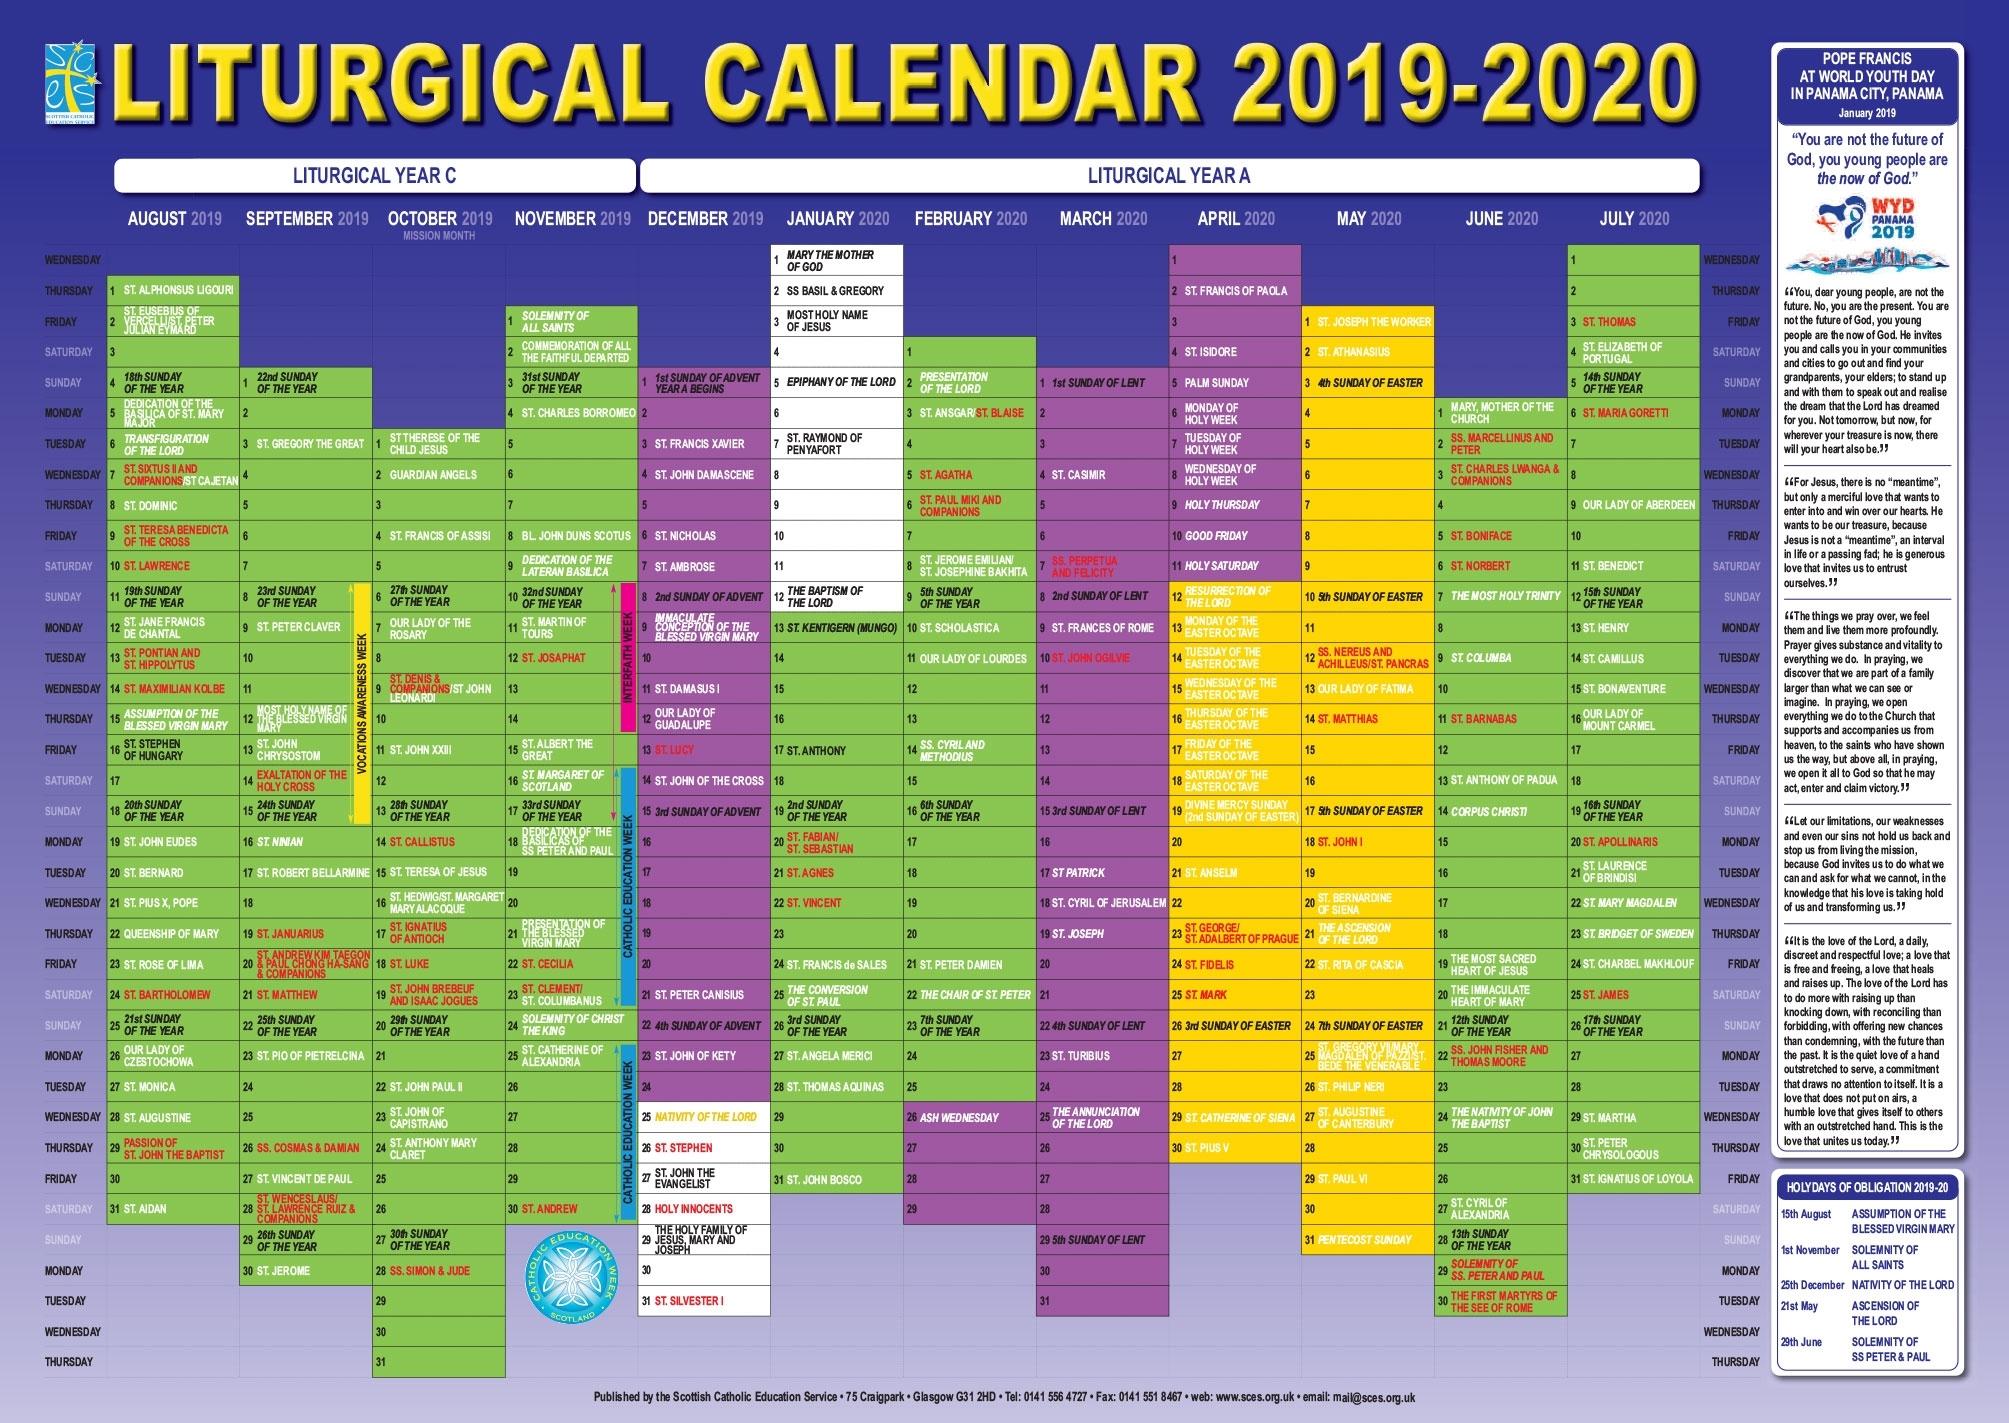 Scottish Catholic Education Service | Sces | Liturgical for Liturgical Calendar 2019 2020 Catholic